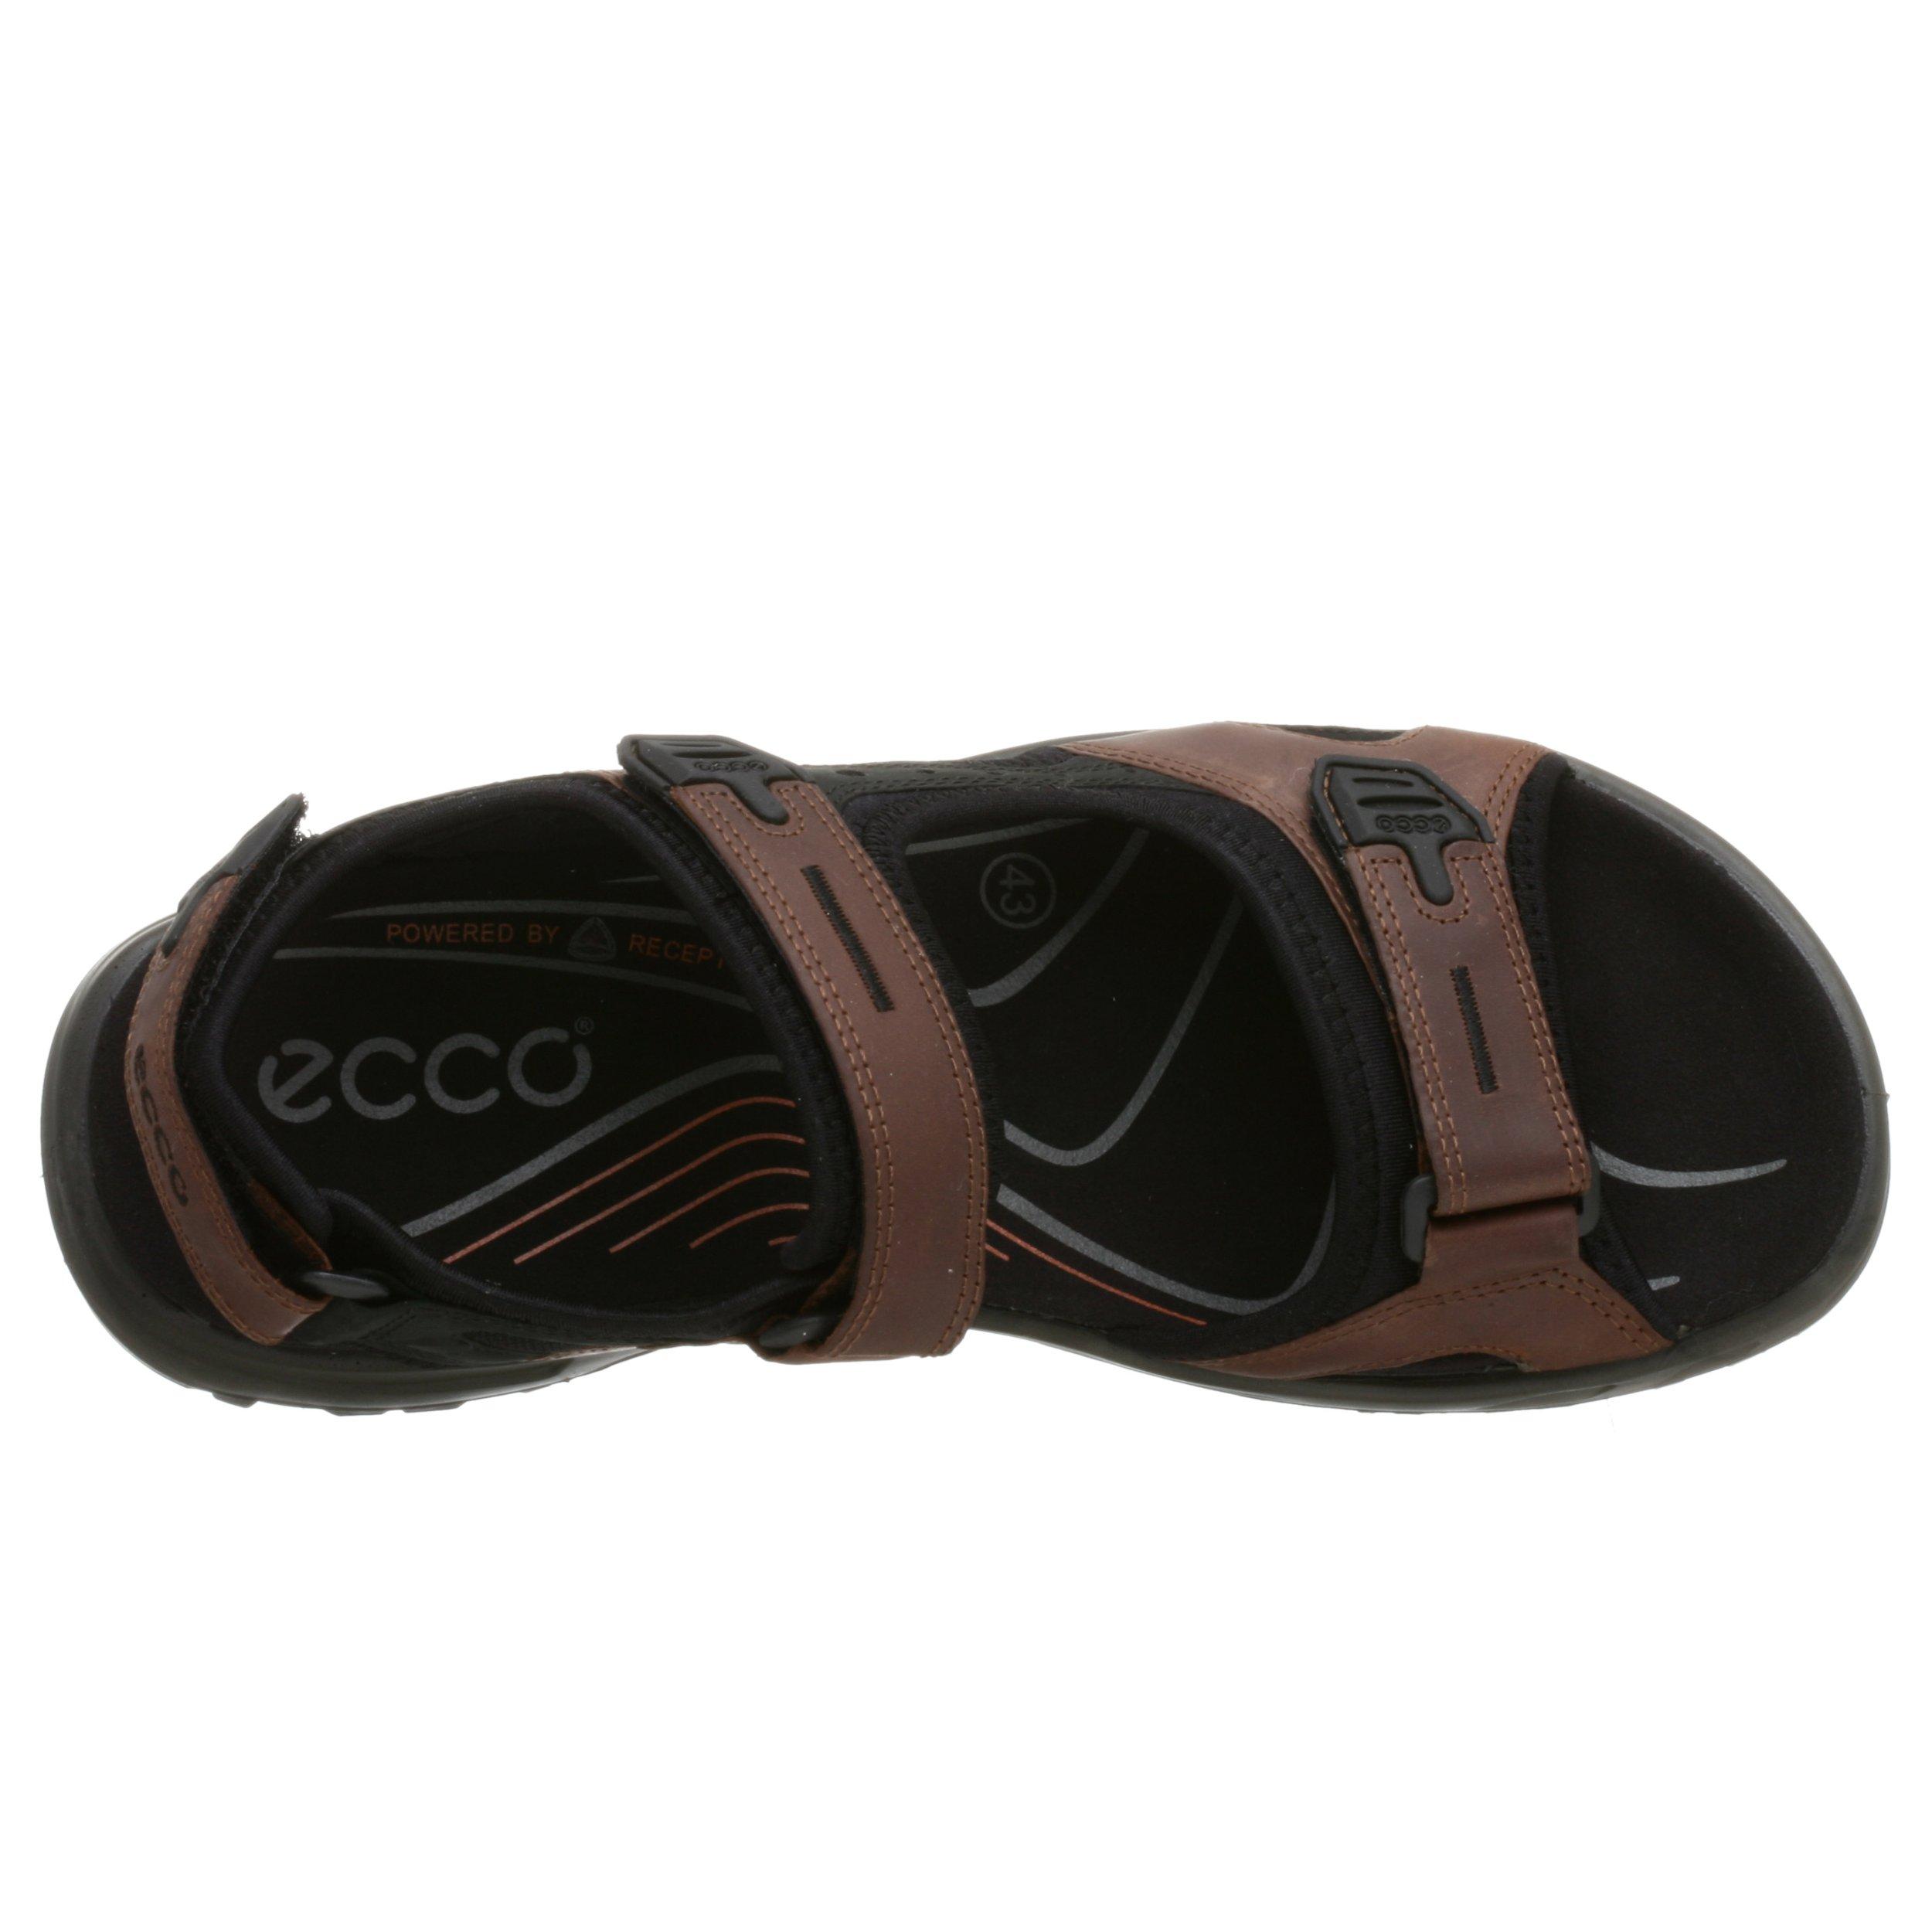 ECCO Men's Yucatan Sandal,Bison/Black/Black,44 EU (US Men's 10-10.5 M) by ECCO (Image #7)